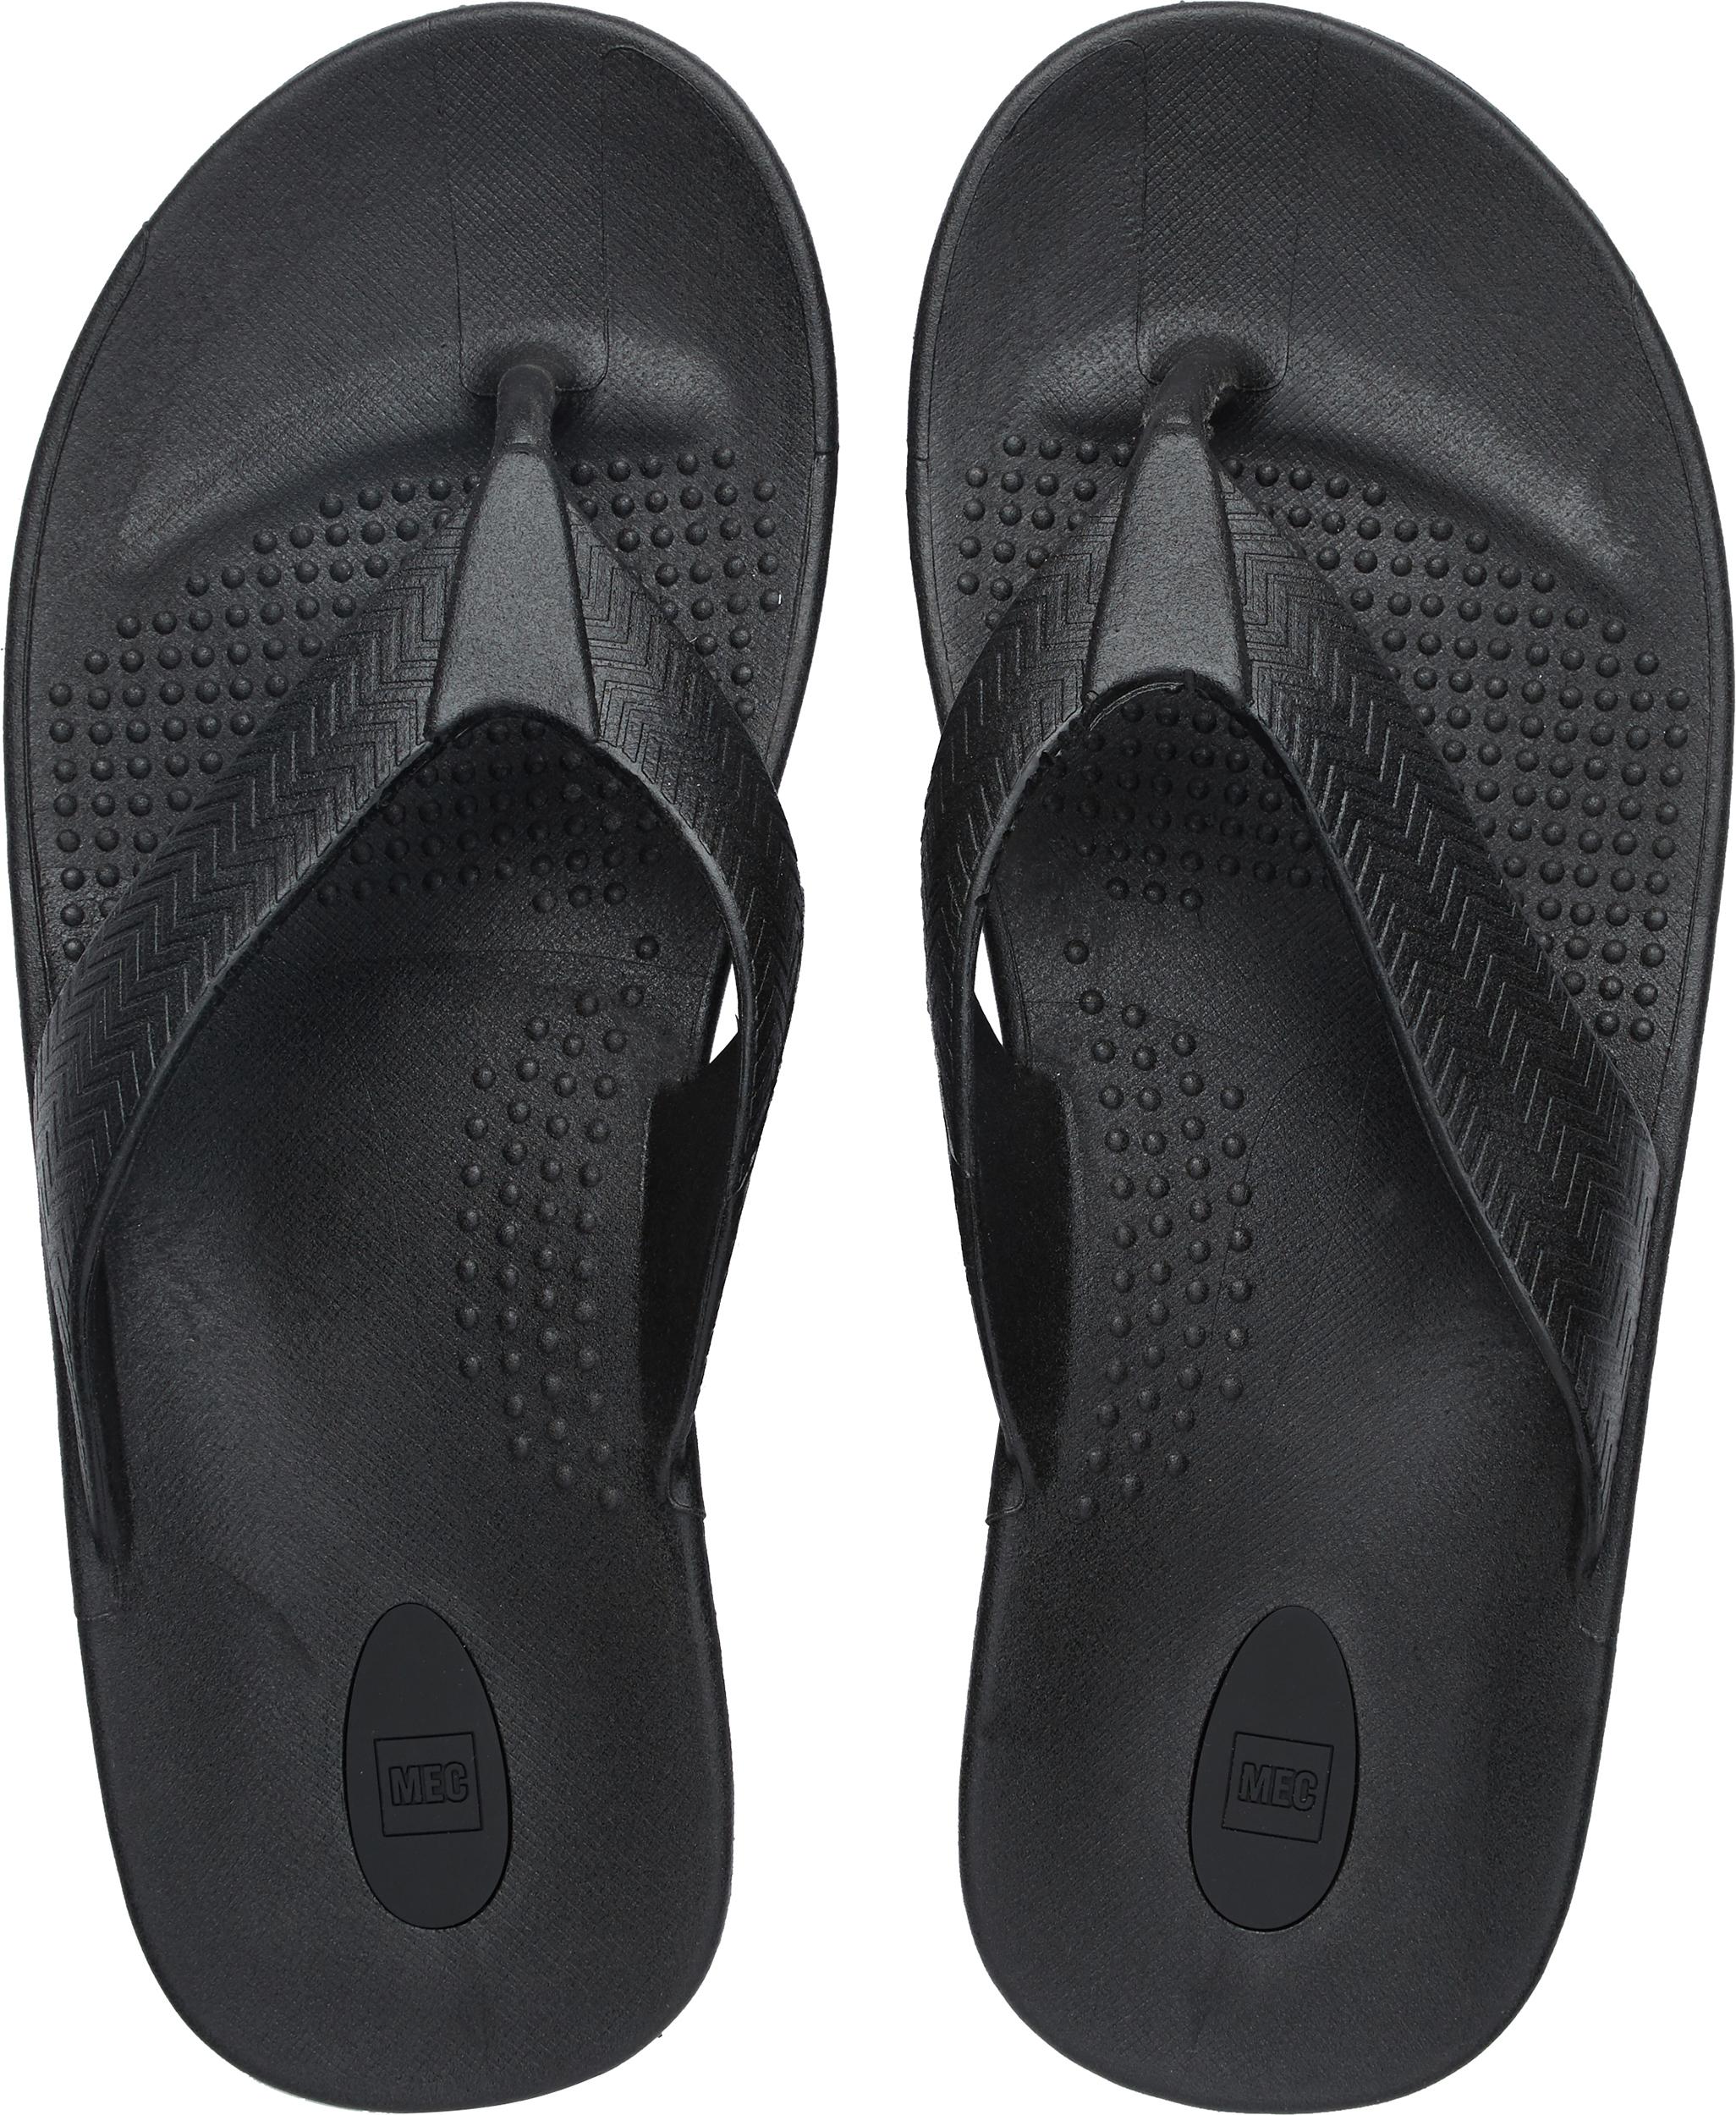 2210b5670 Flip flops